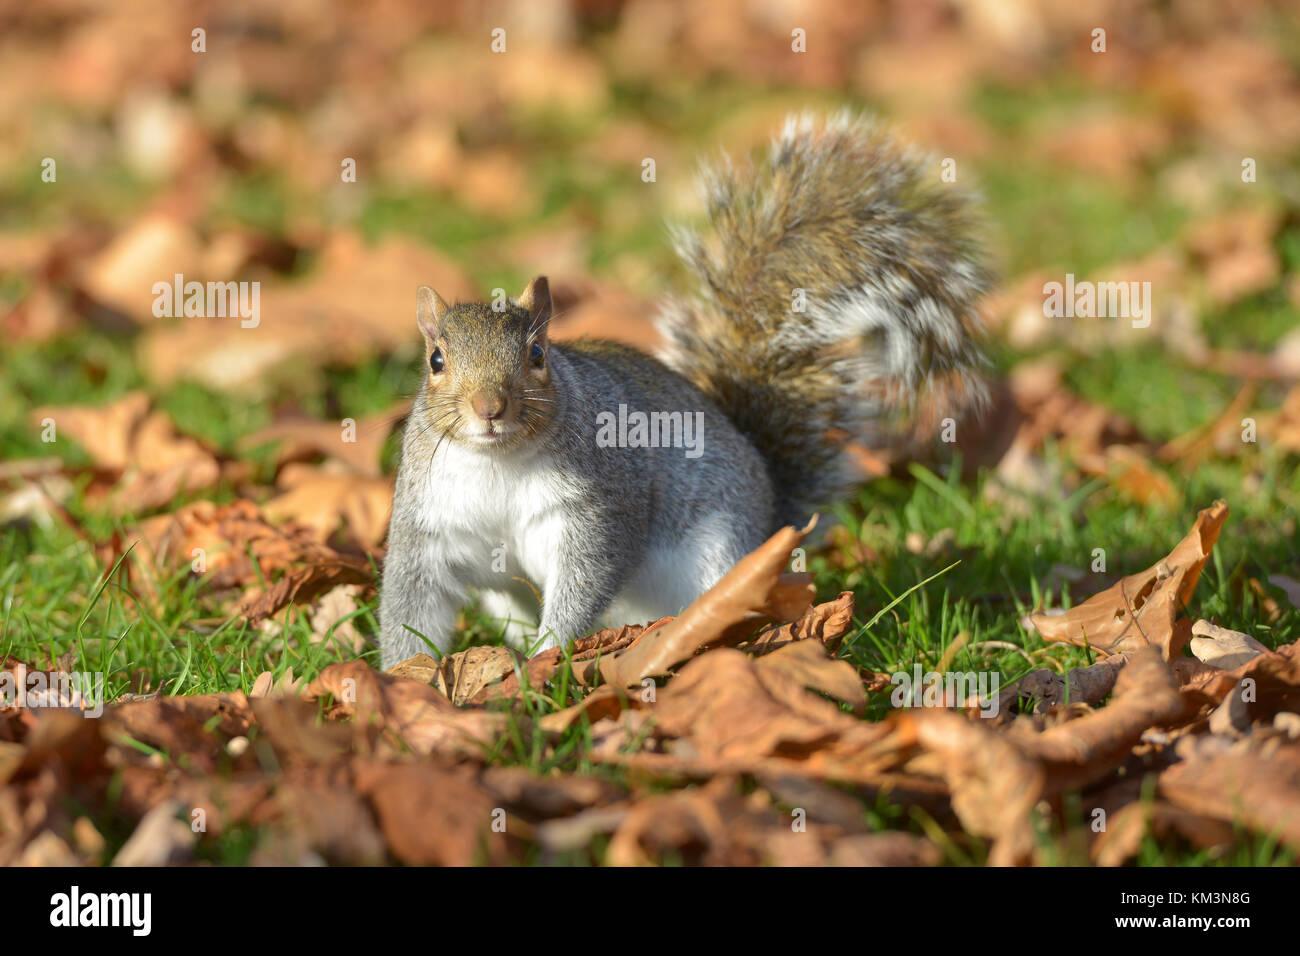 Grey squirrel in Kensington Gardens, London. - Stock Image